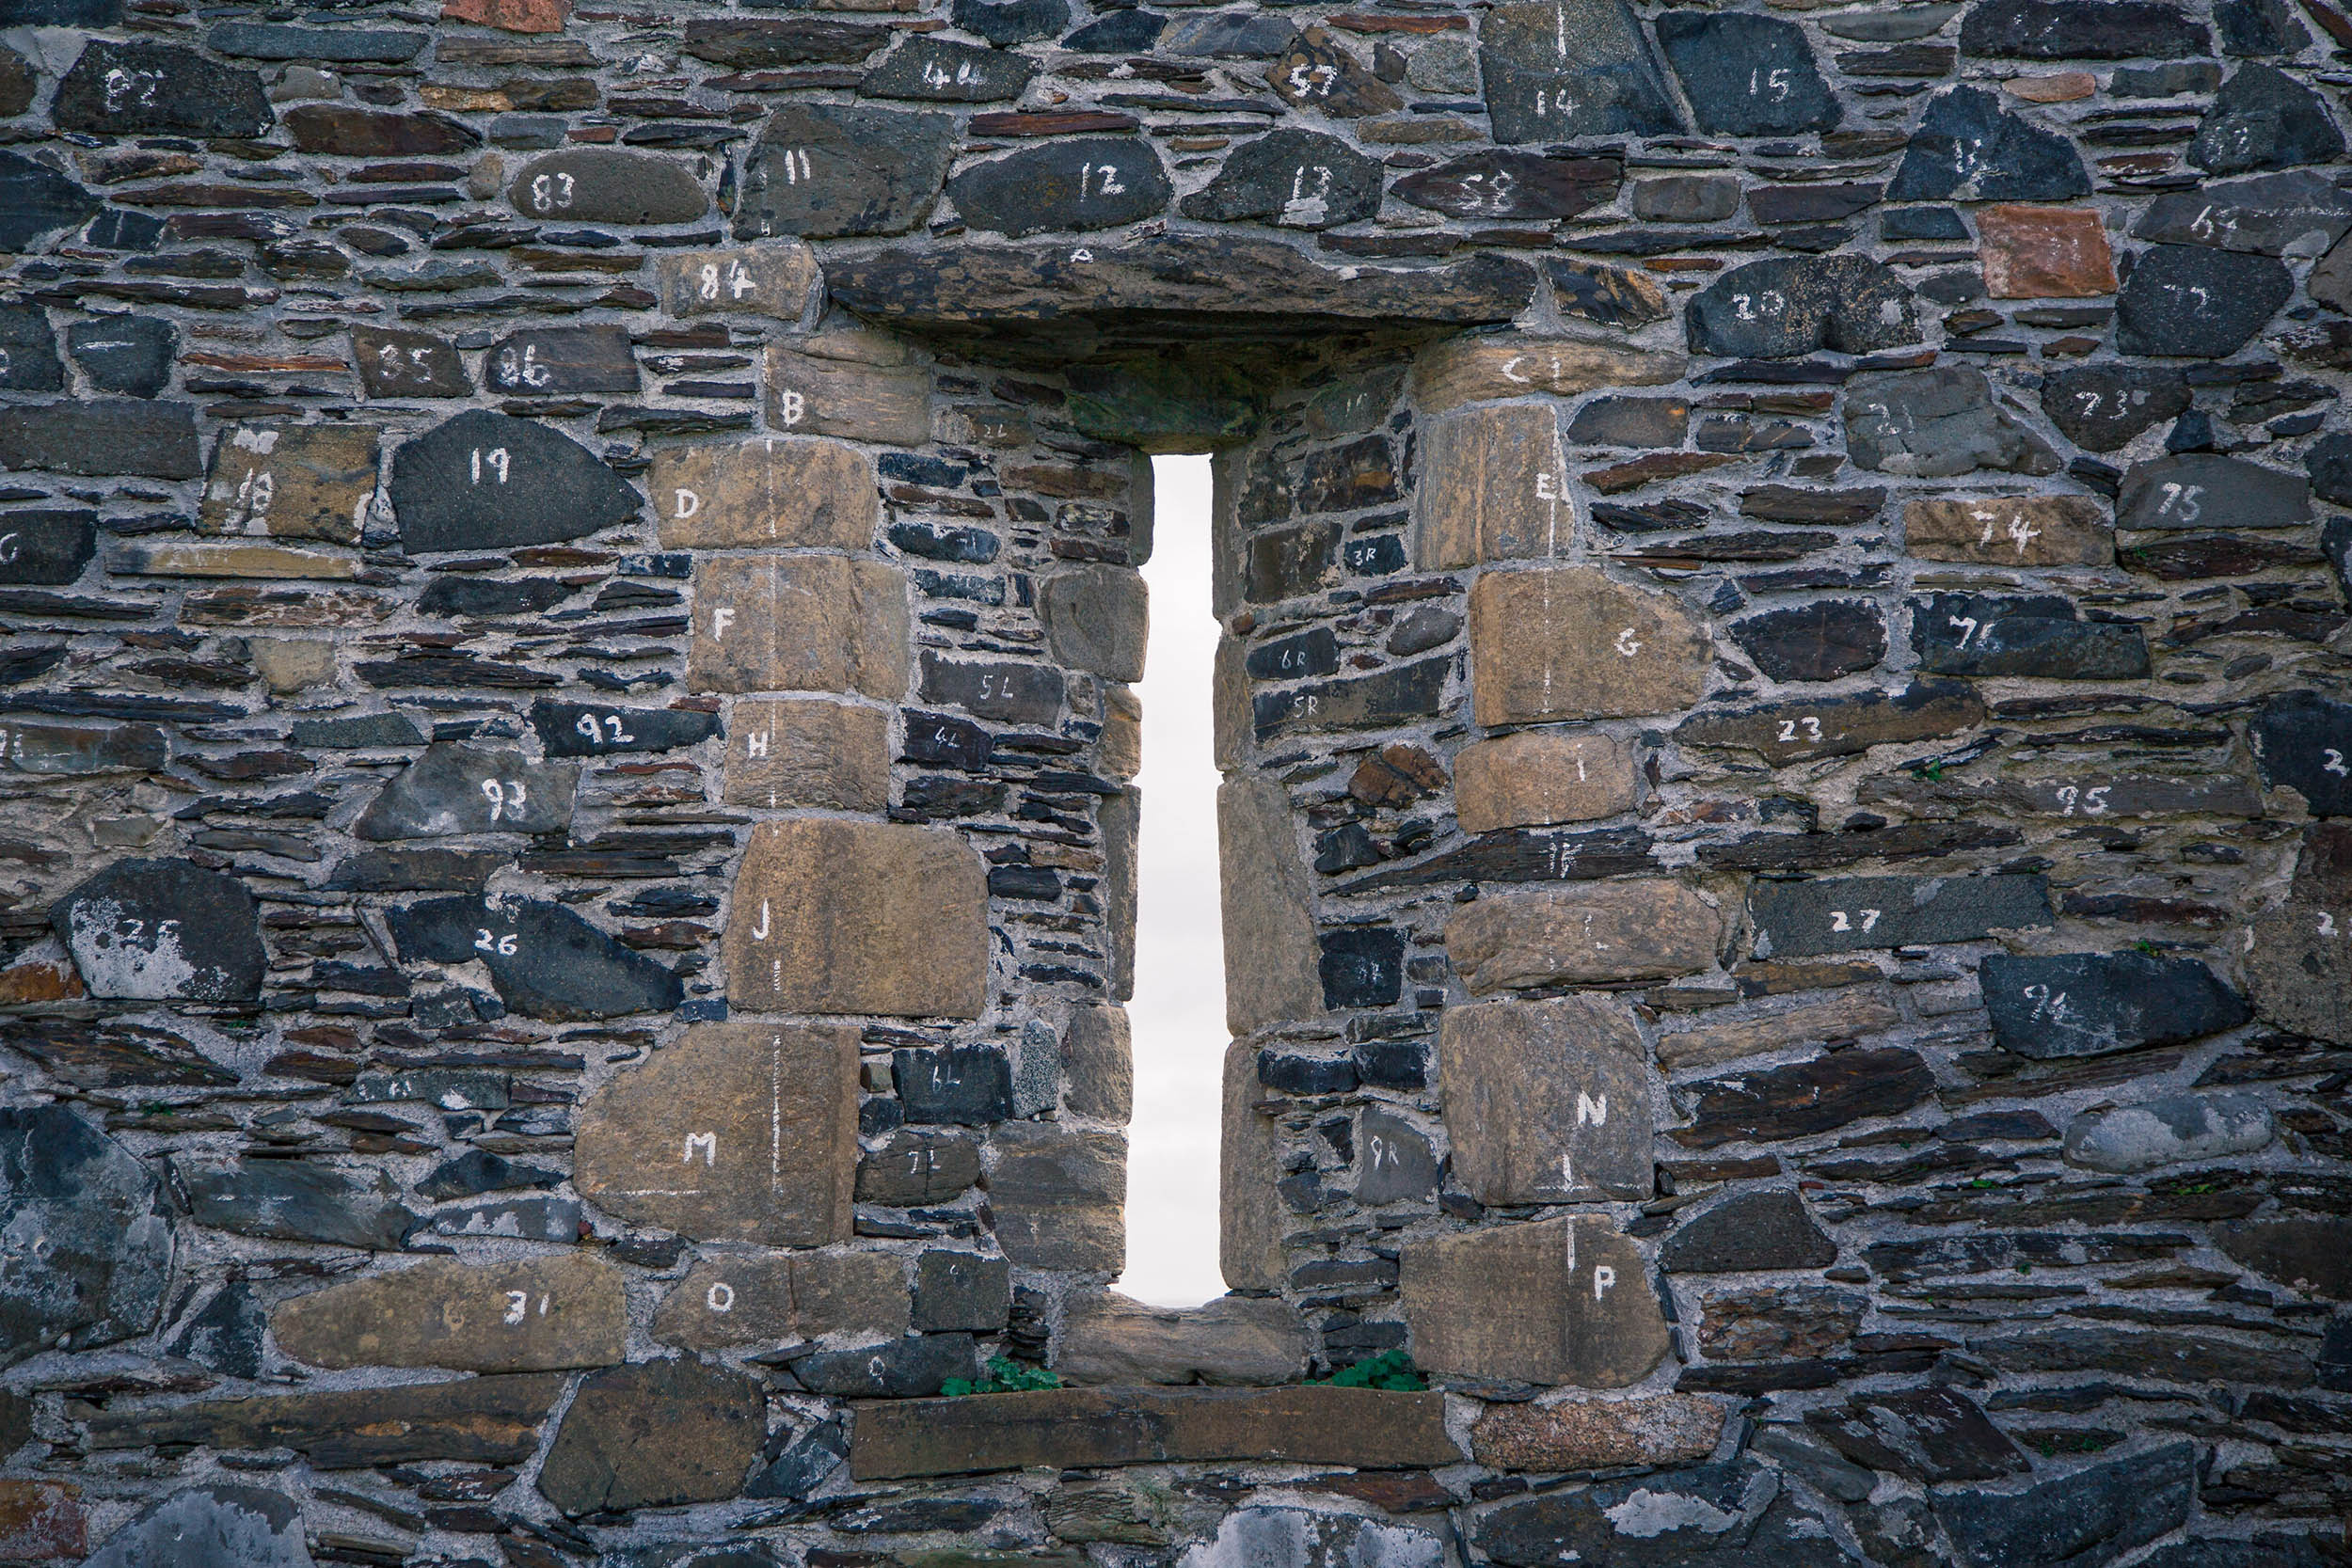 IRELAND_DONEGAL_PORTNOO_0012